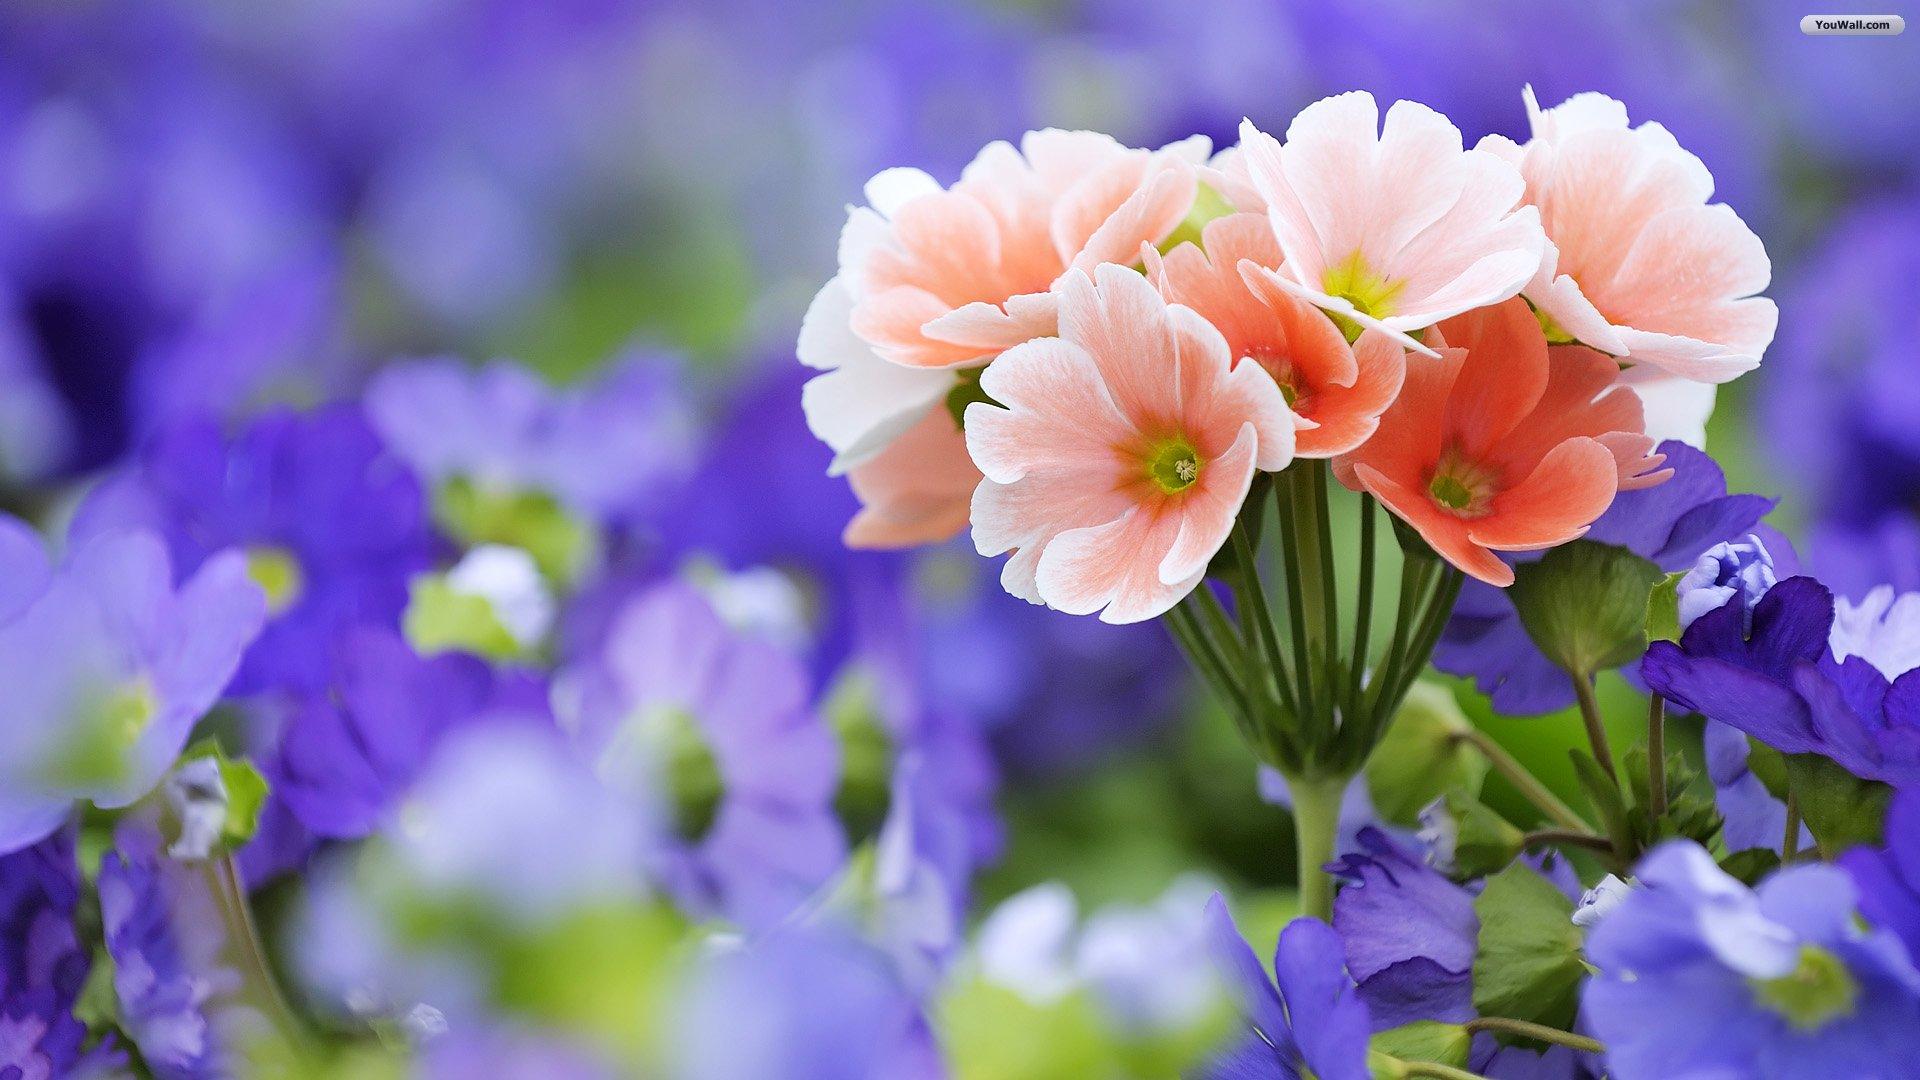 Wonderful Wallpapers Of Beautiful Flowers (55 Wallpapers)